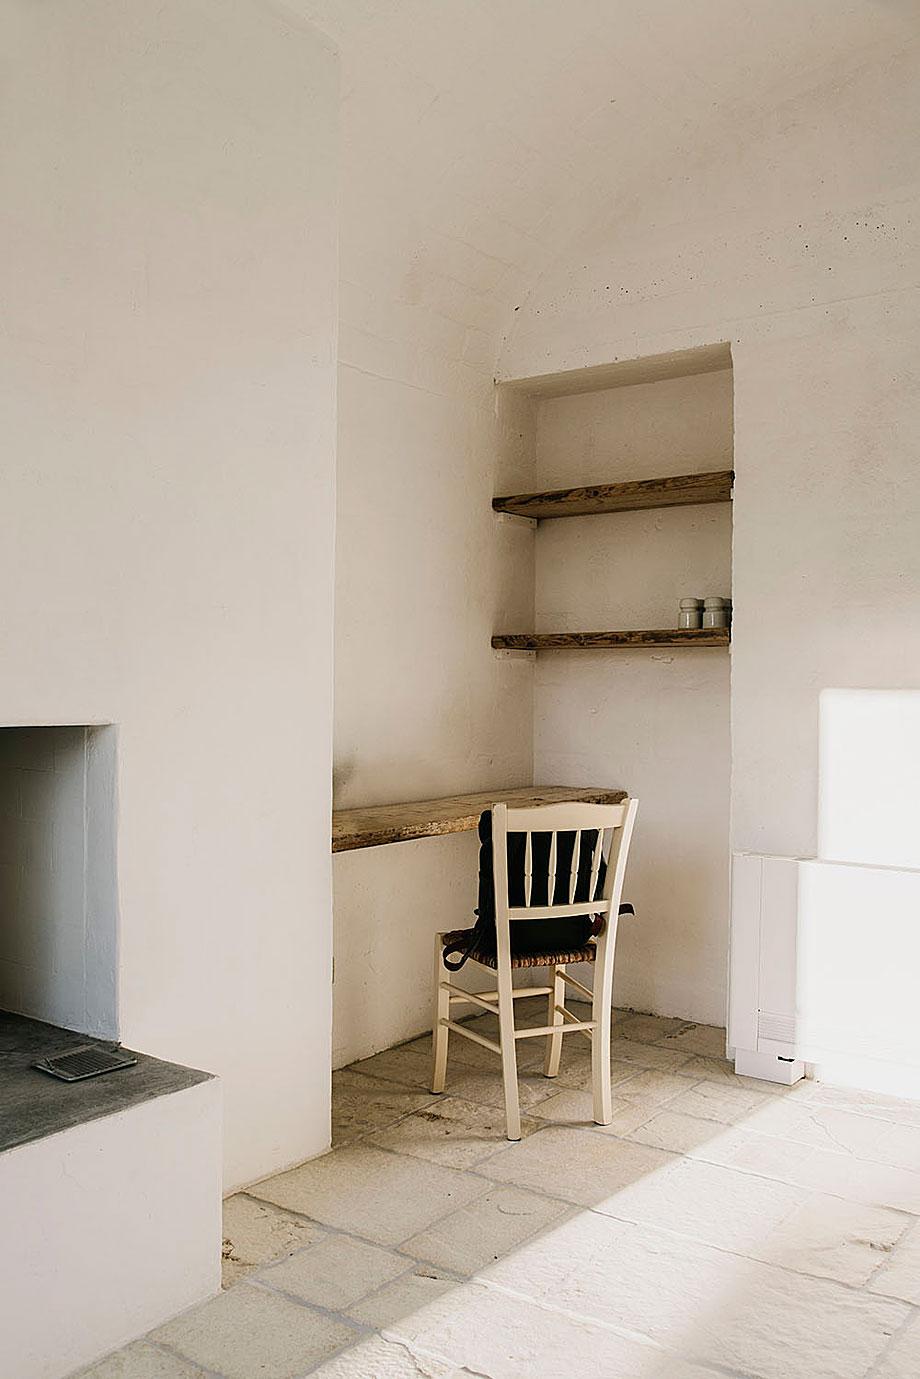 masseria-moroseta-andrew-trotter-architecture-puglia-ostuni-openhouse-21